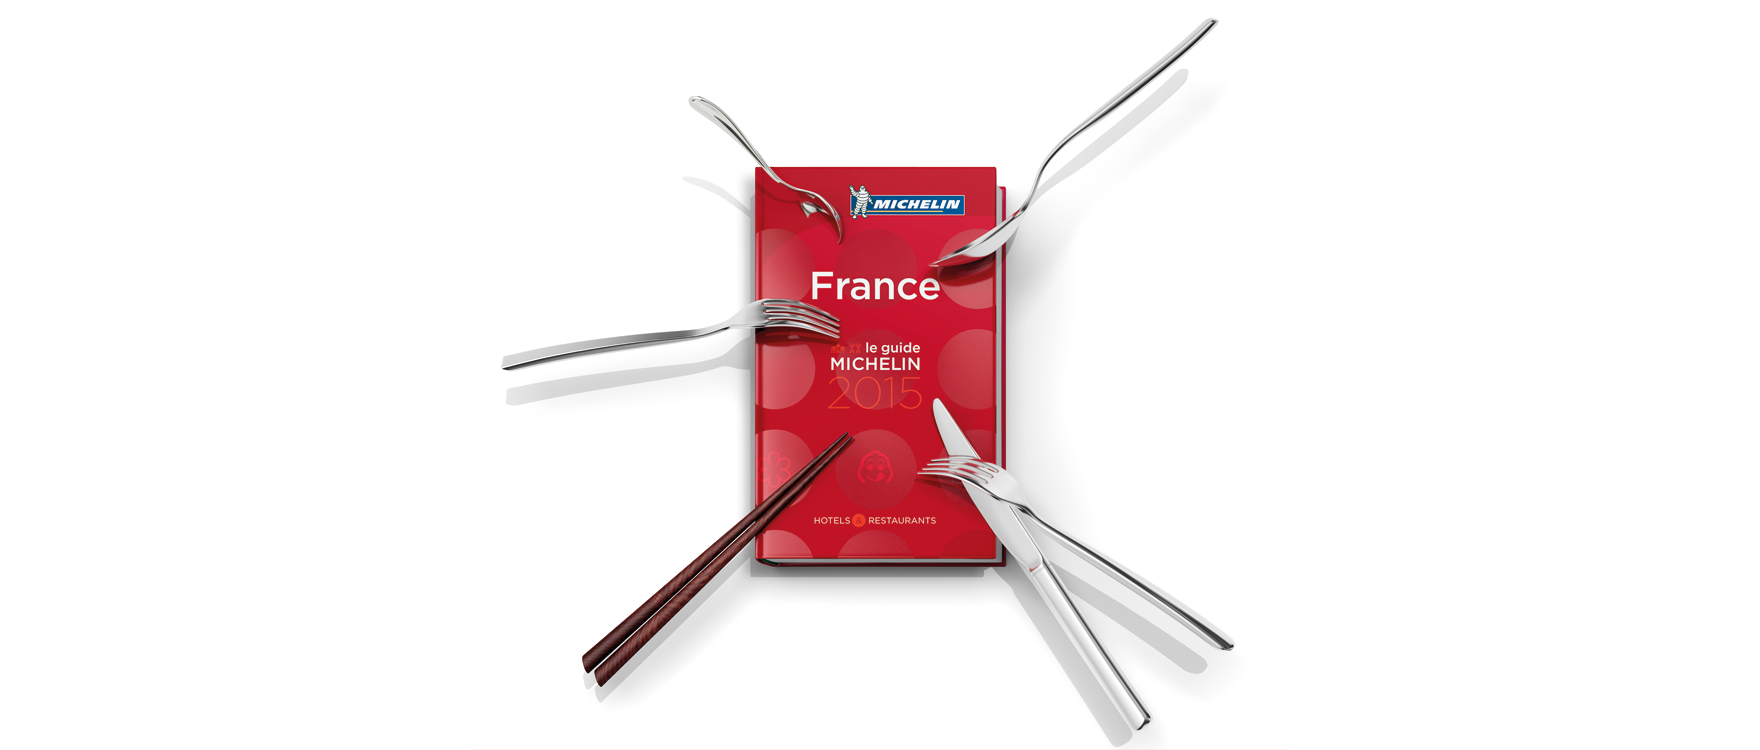 Guide Michelin, Guide Michelin France, Guide Michelin 2015, France, Guide Rouge, Guide Gastronomique